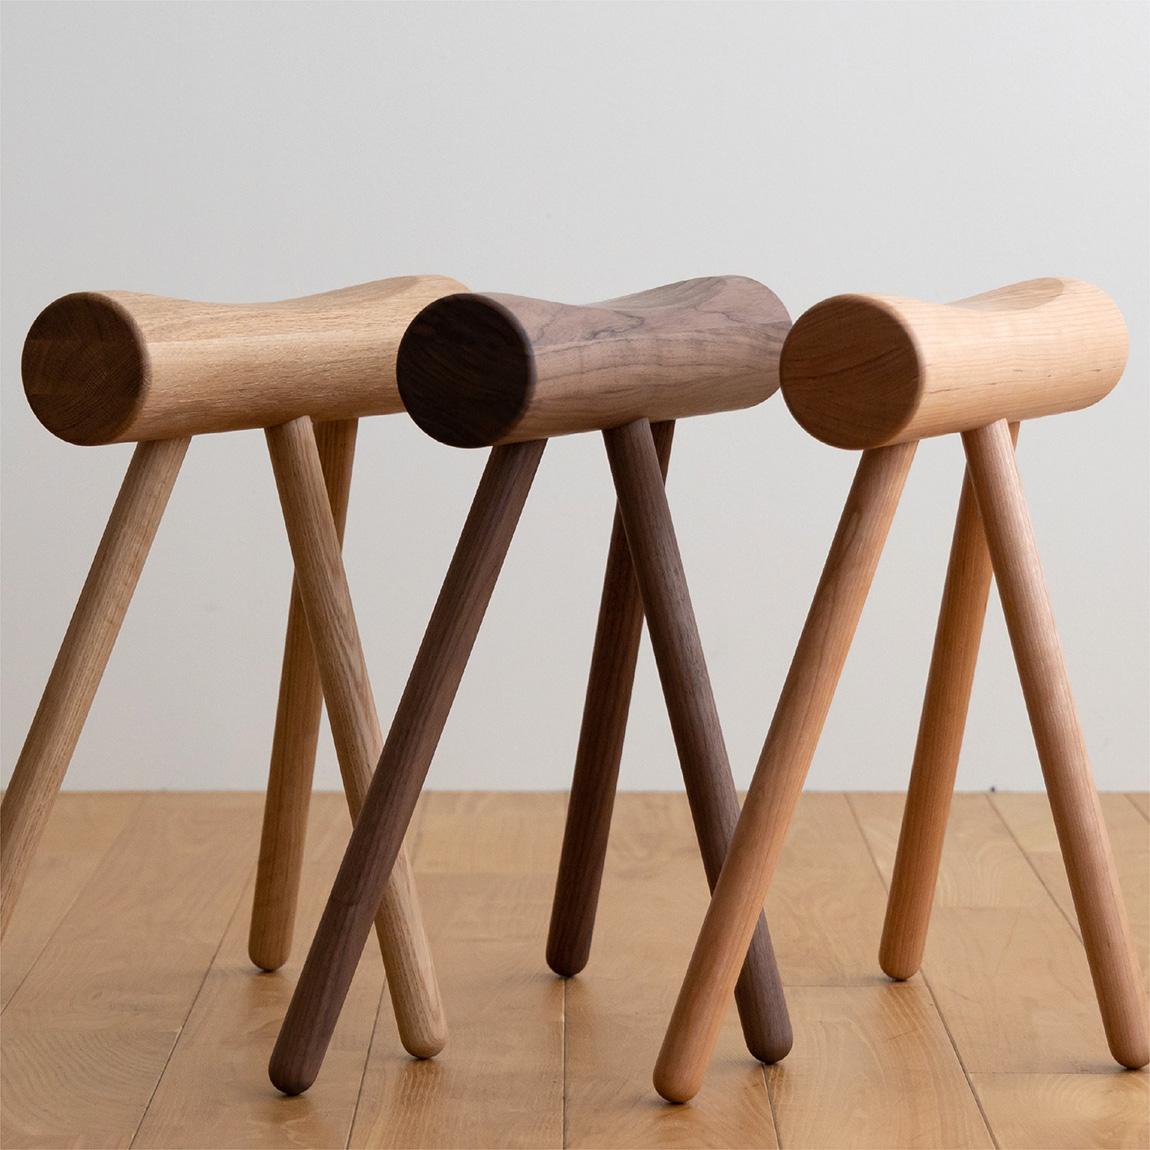 entrance stool(oak,walnut,cherry)